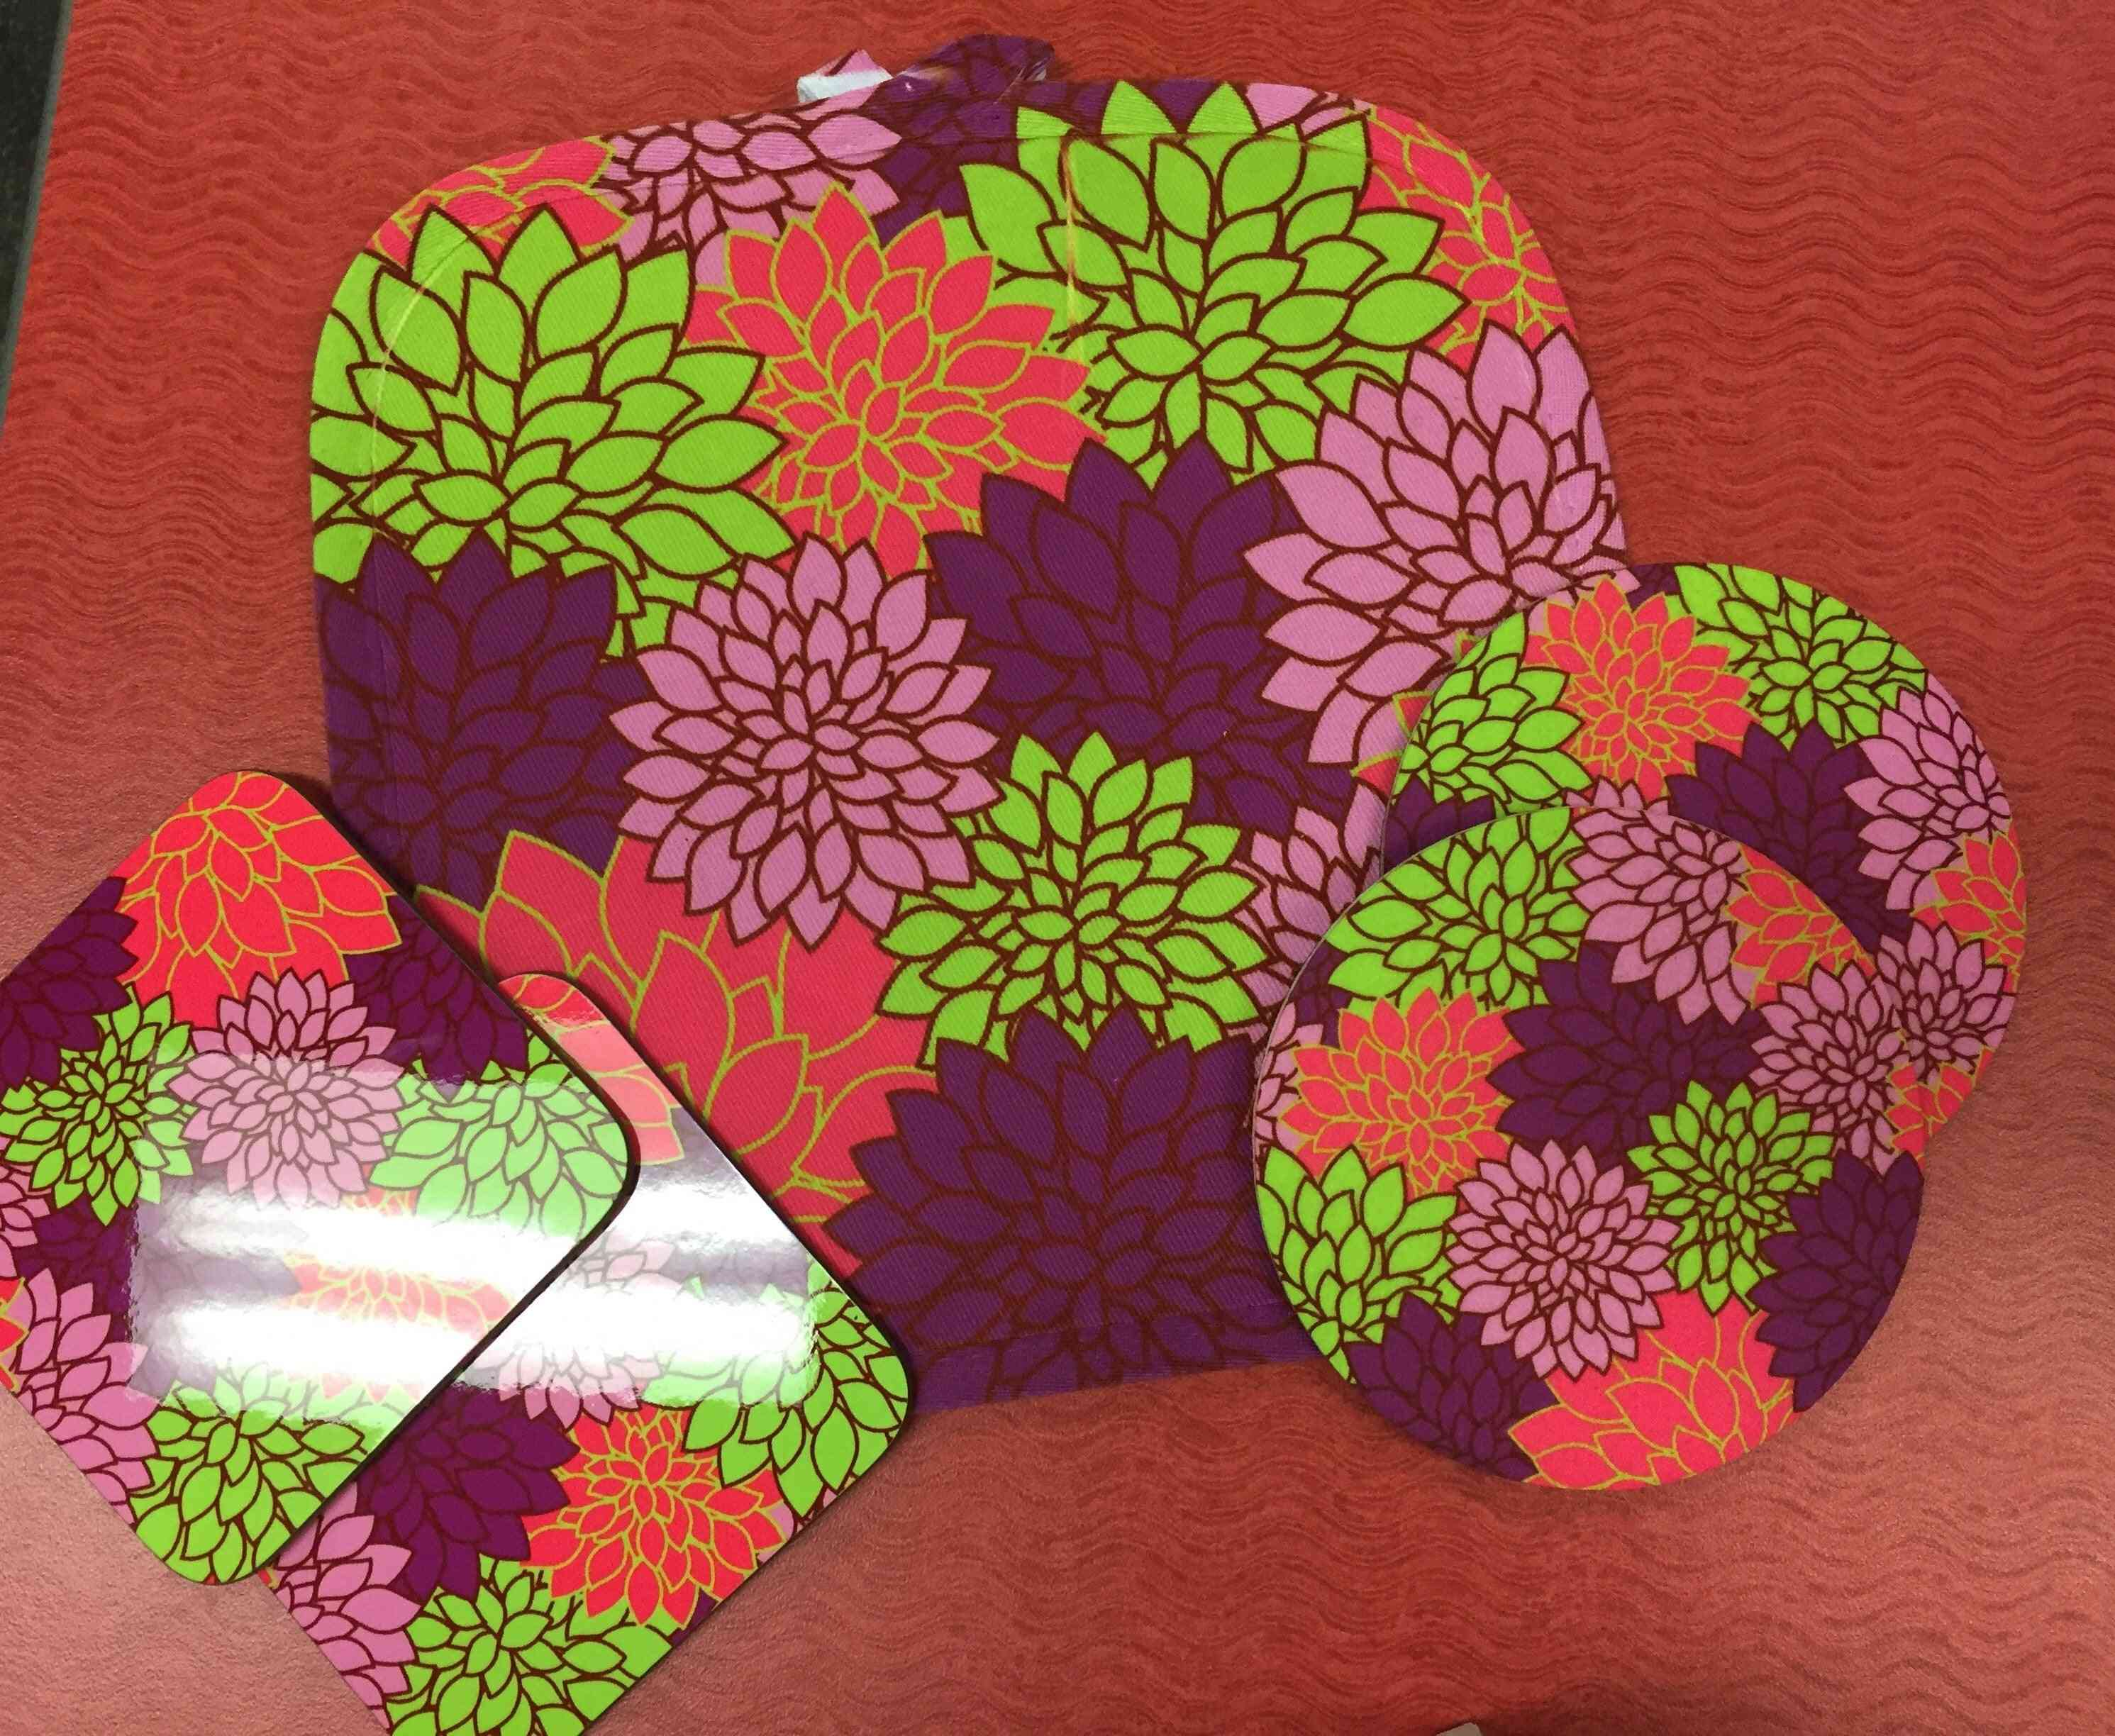 Vibrant Floral Kitchen Set-pot Holder And Coasters